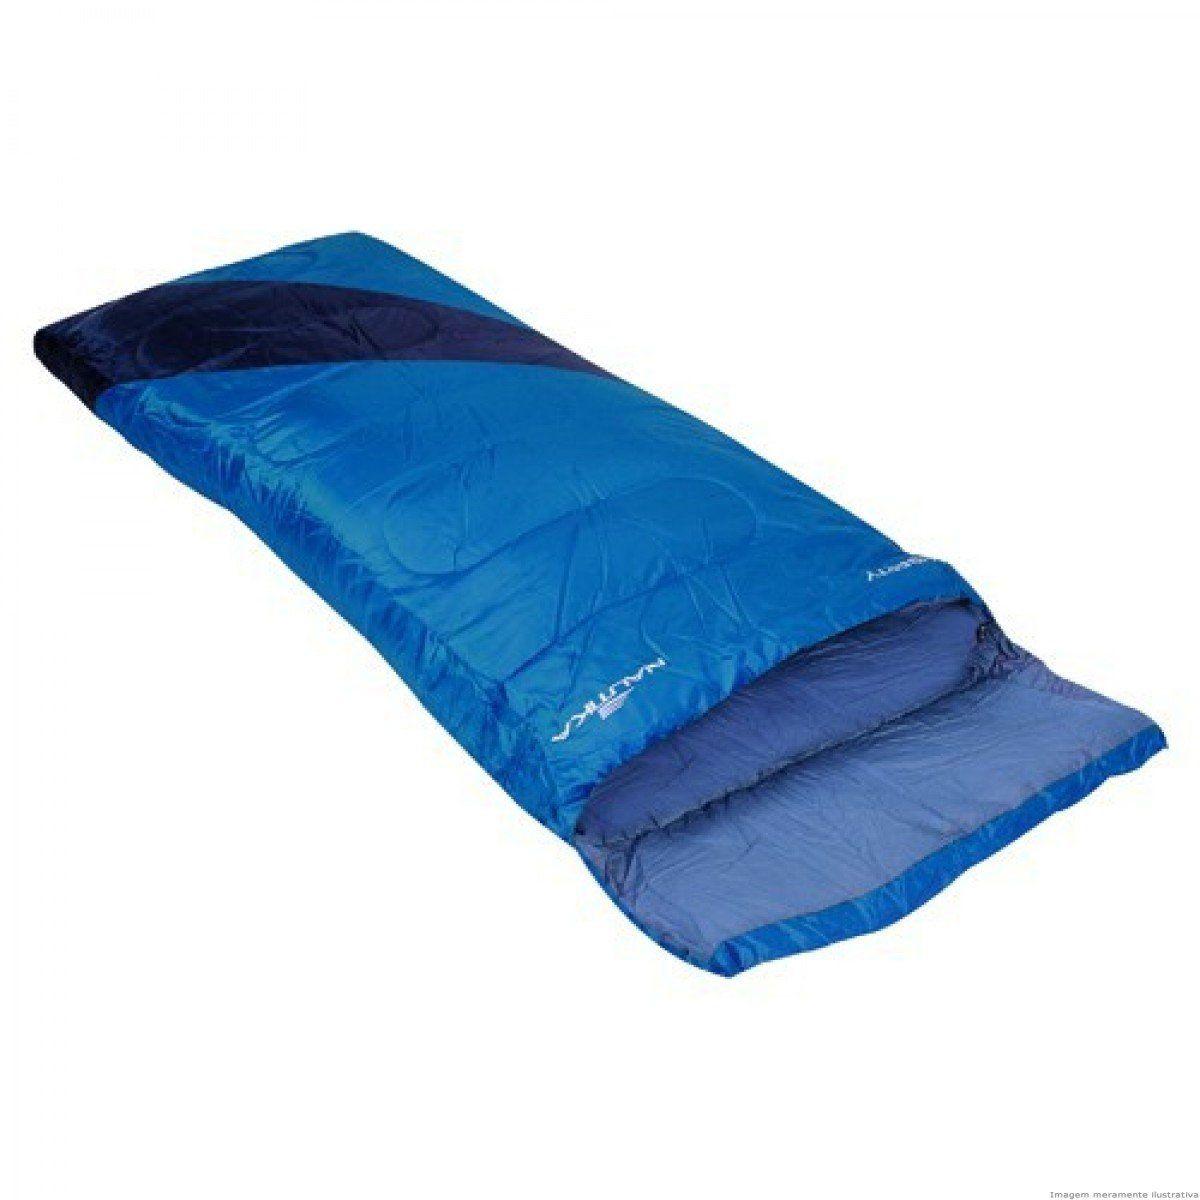 Kit Barraca Nautika 3/4 + Saco de dormir